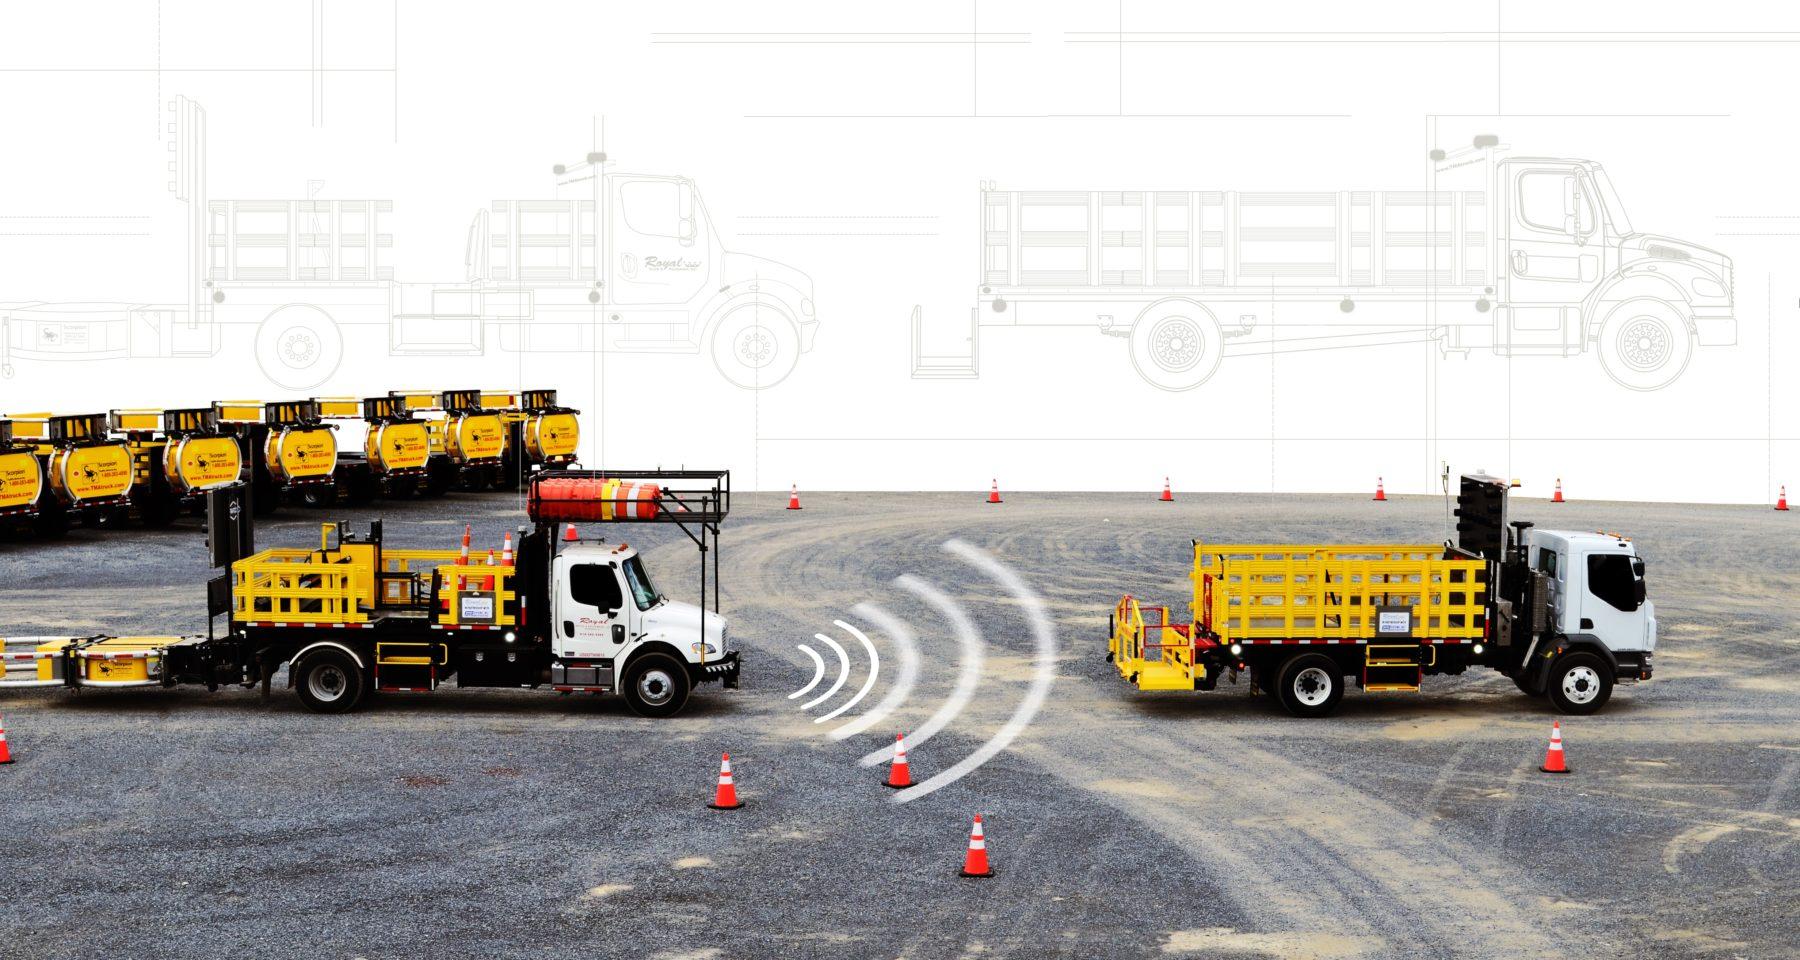 via Royal Truck & Equipment